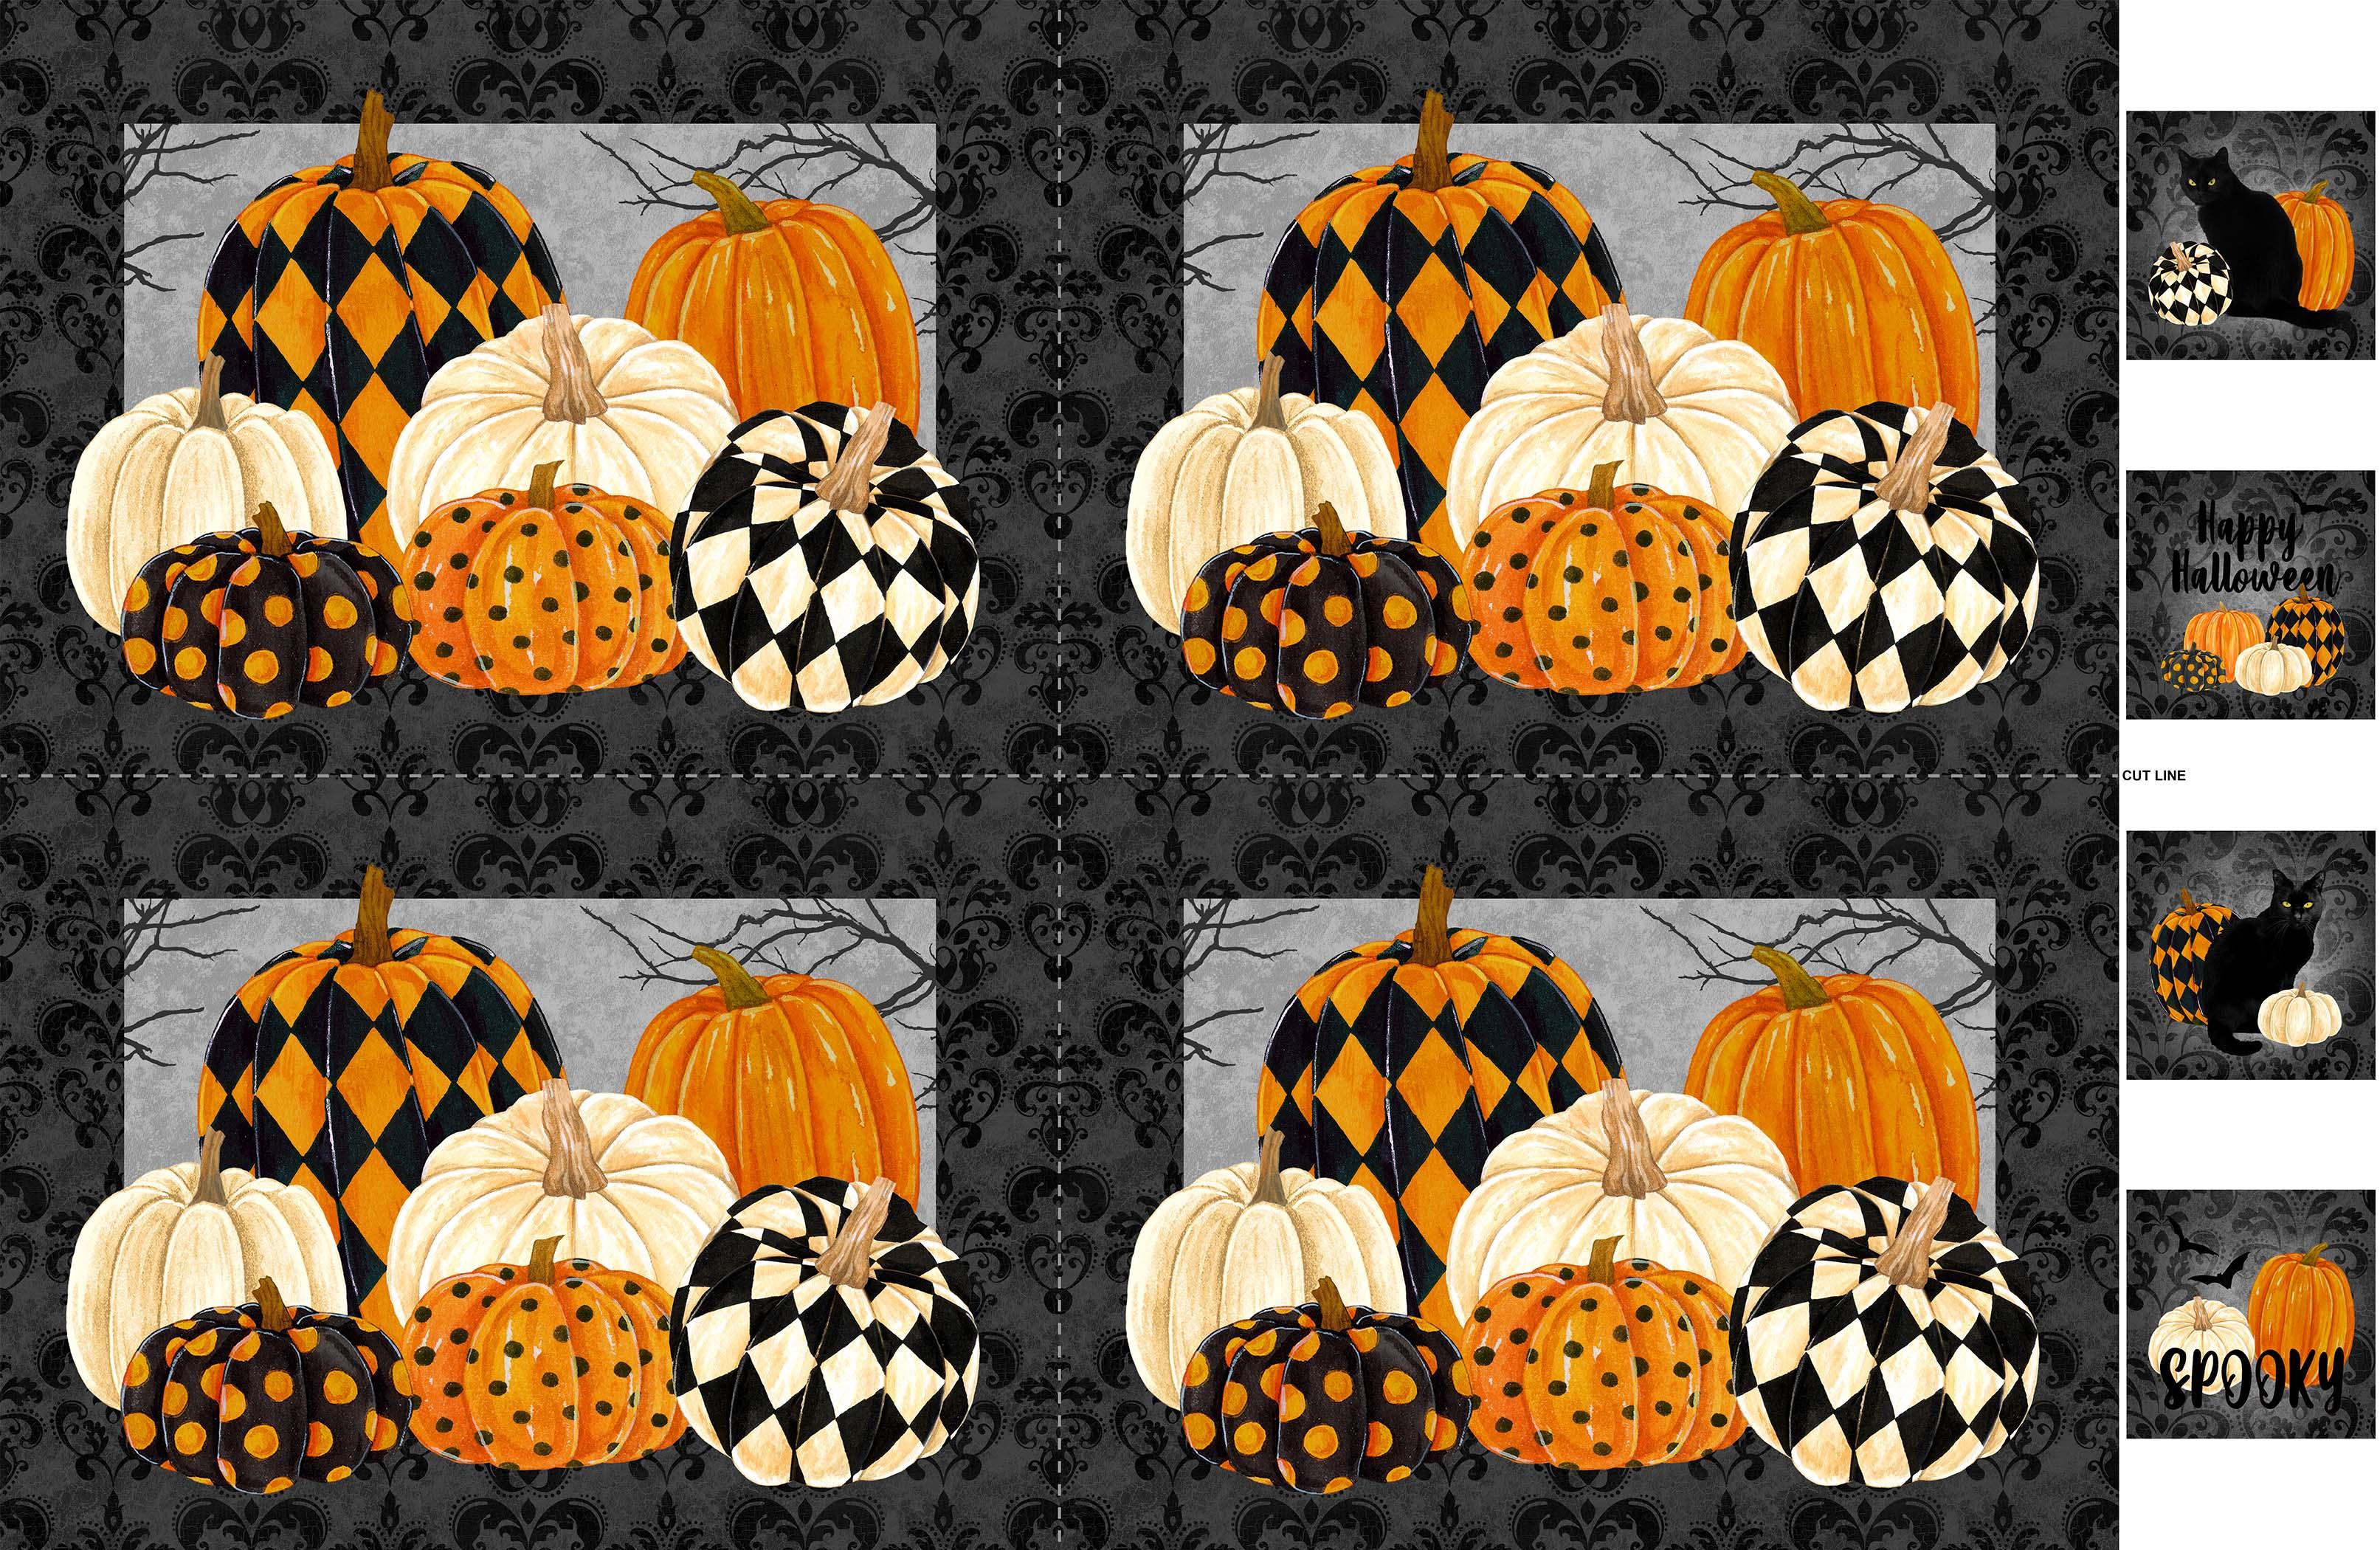 BLACK CAT CAPERS DP24127 99 (2 placemats)